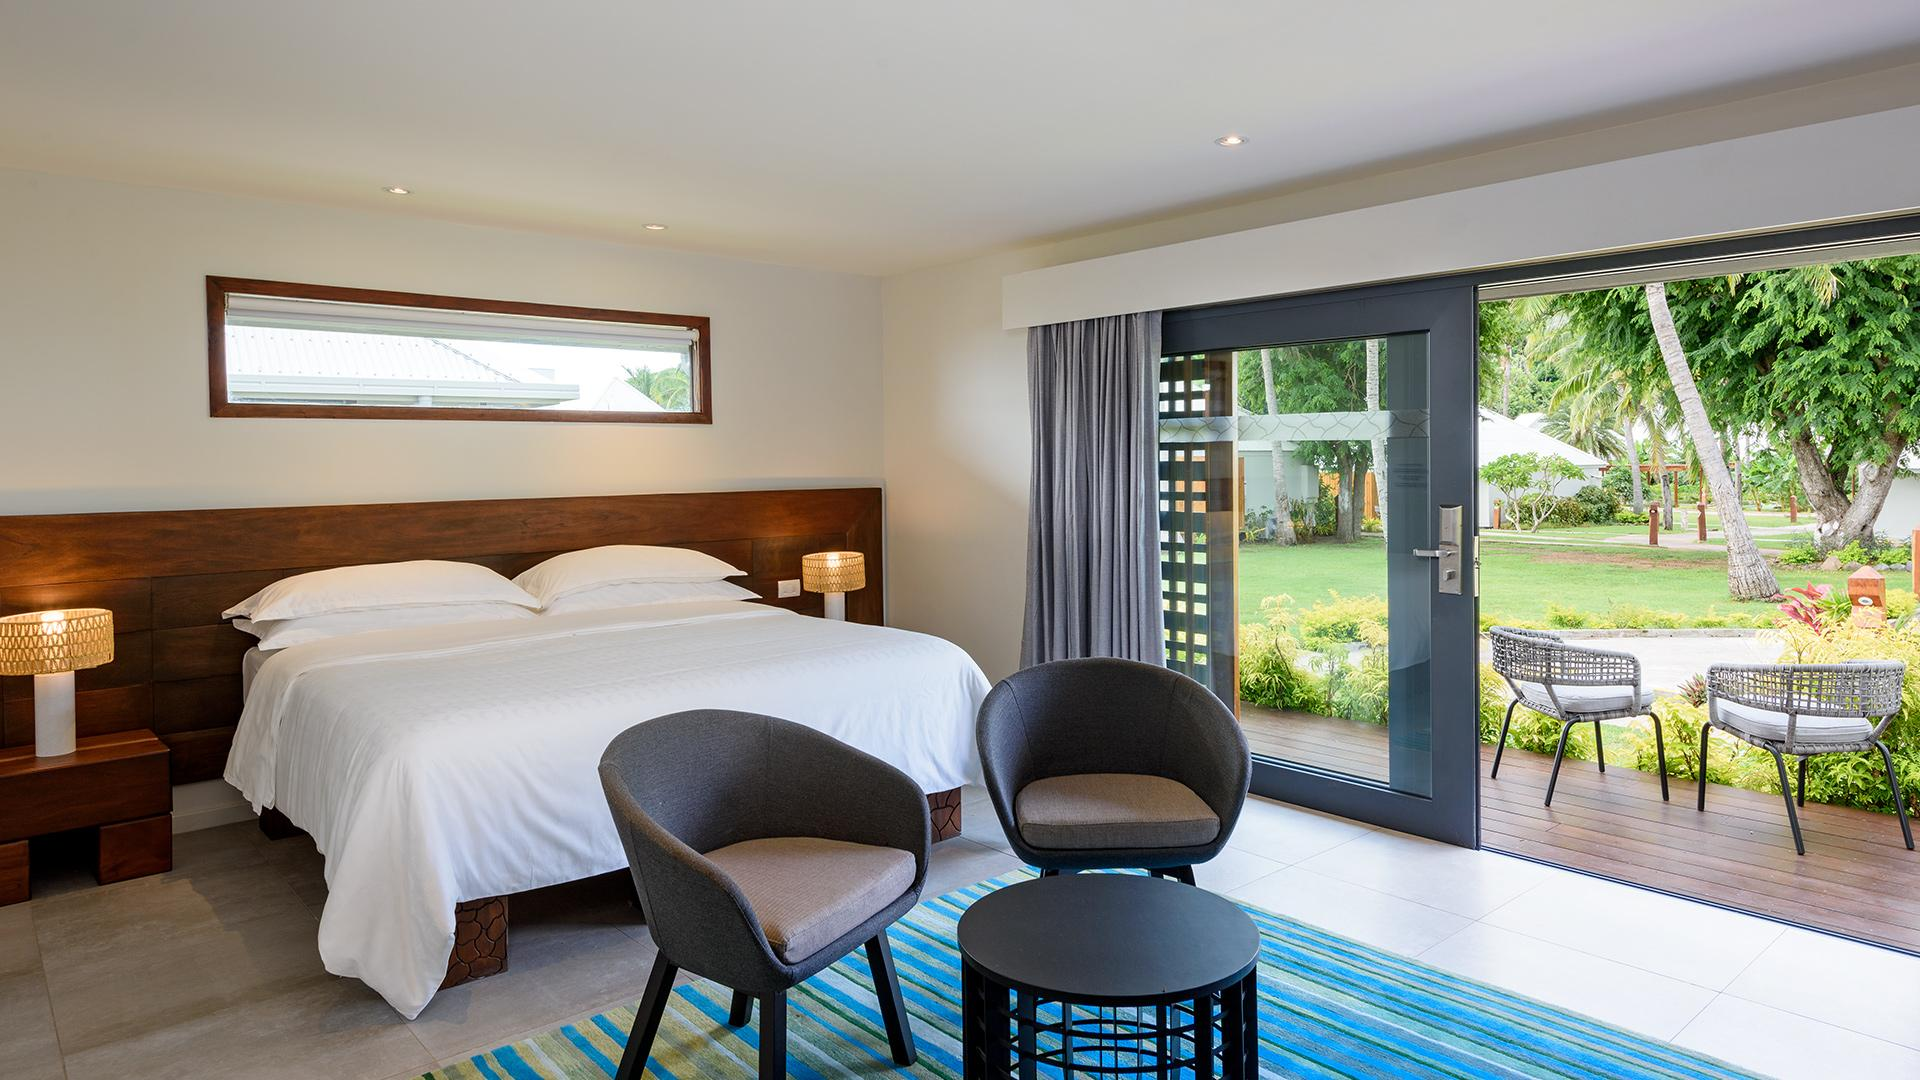 Island View image 1 at Sheraton Resort & Spa, Tokoriki Island, Fiji by null, null, Fiji